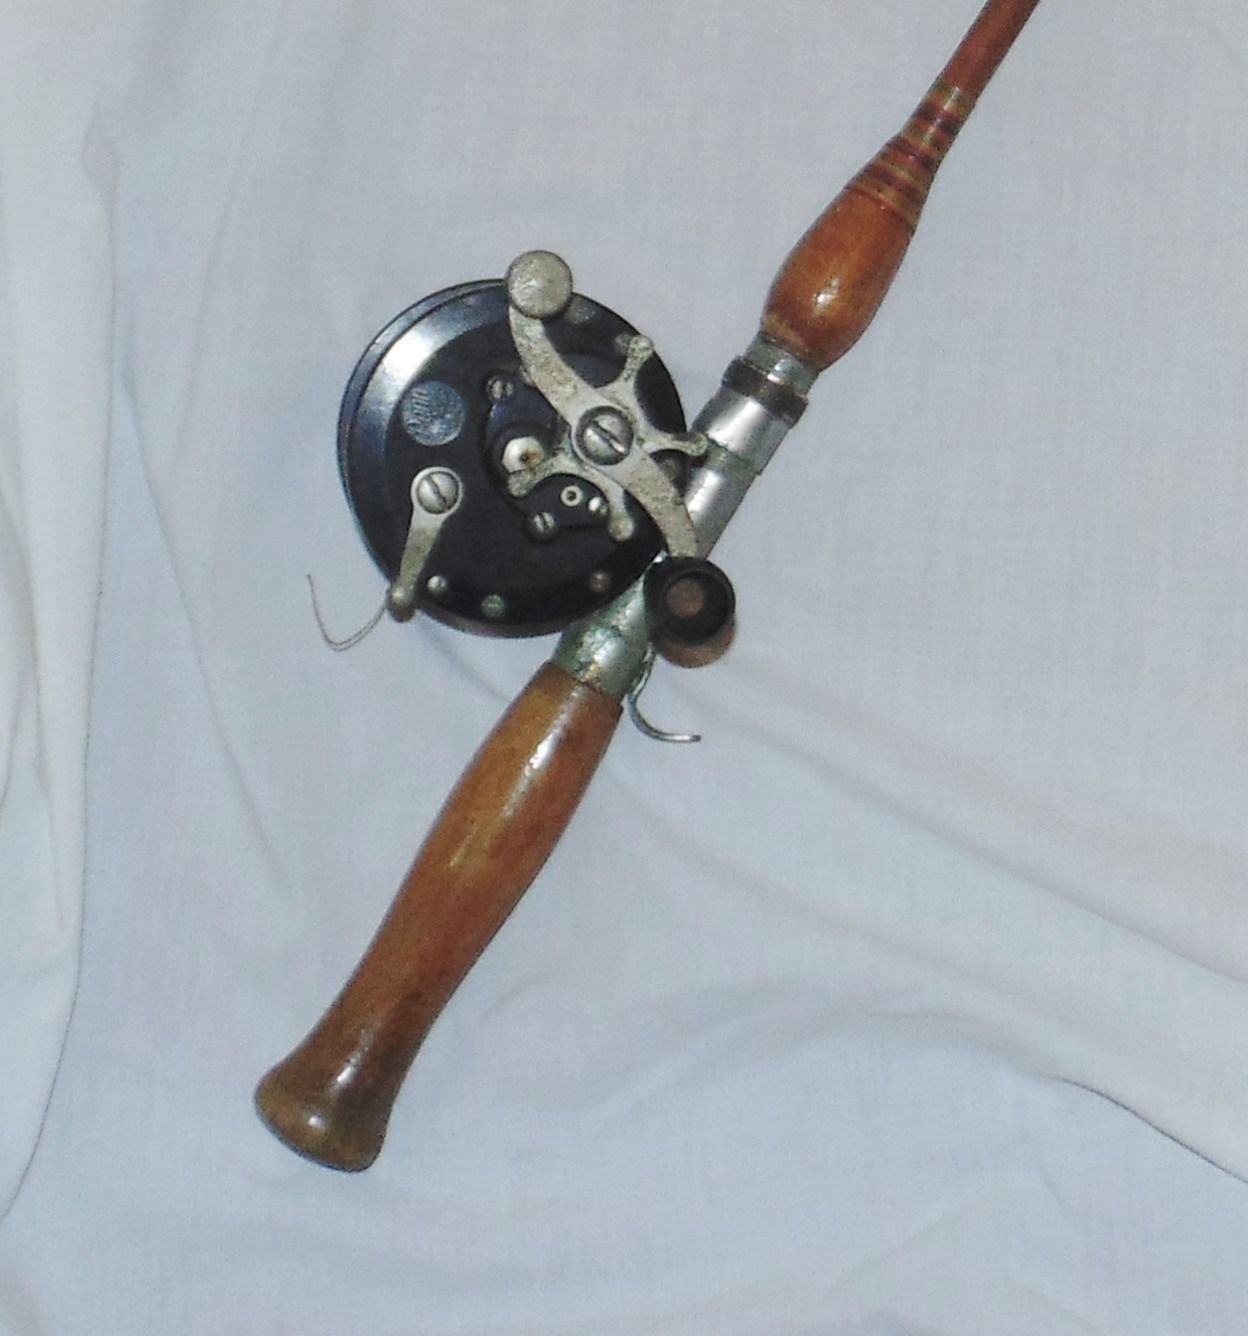 Vintage 52 Bamboo Fishing Rod With Penn 85 Reel Wood Handle